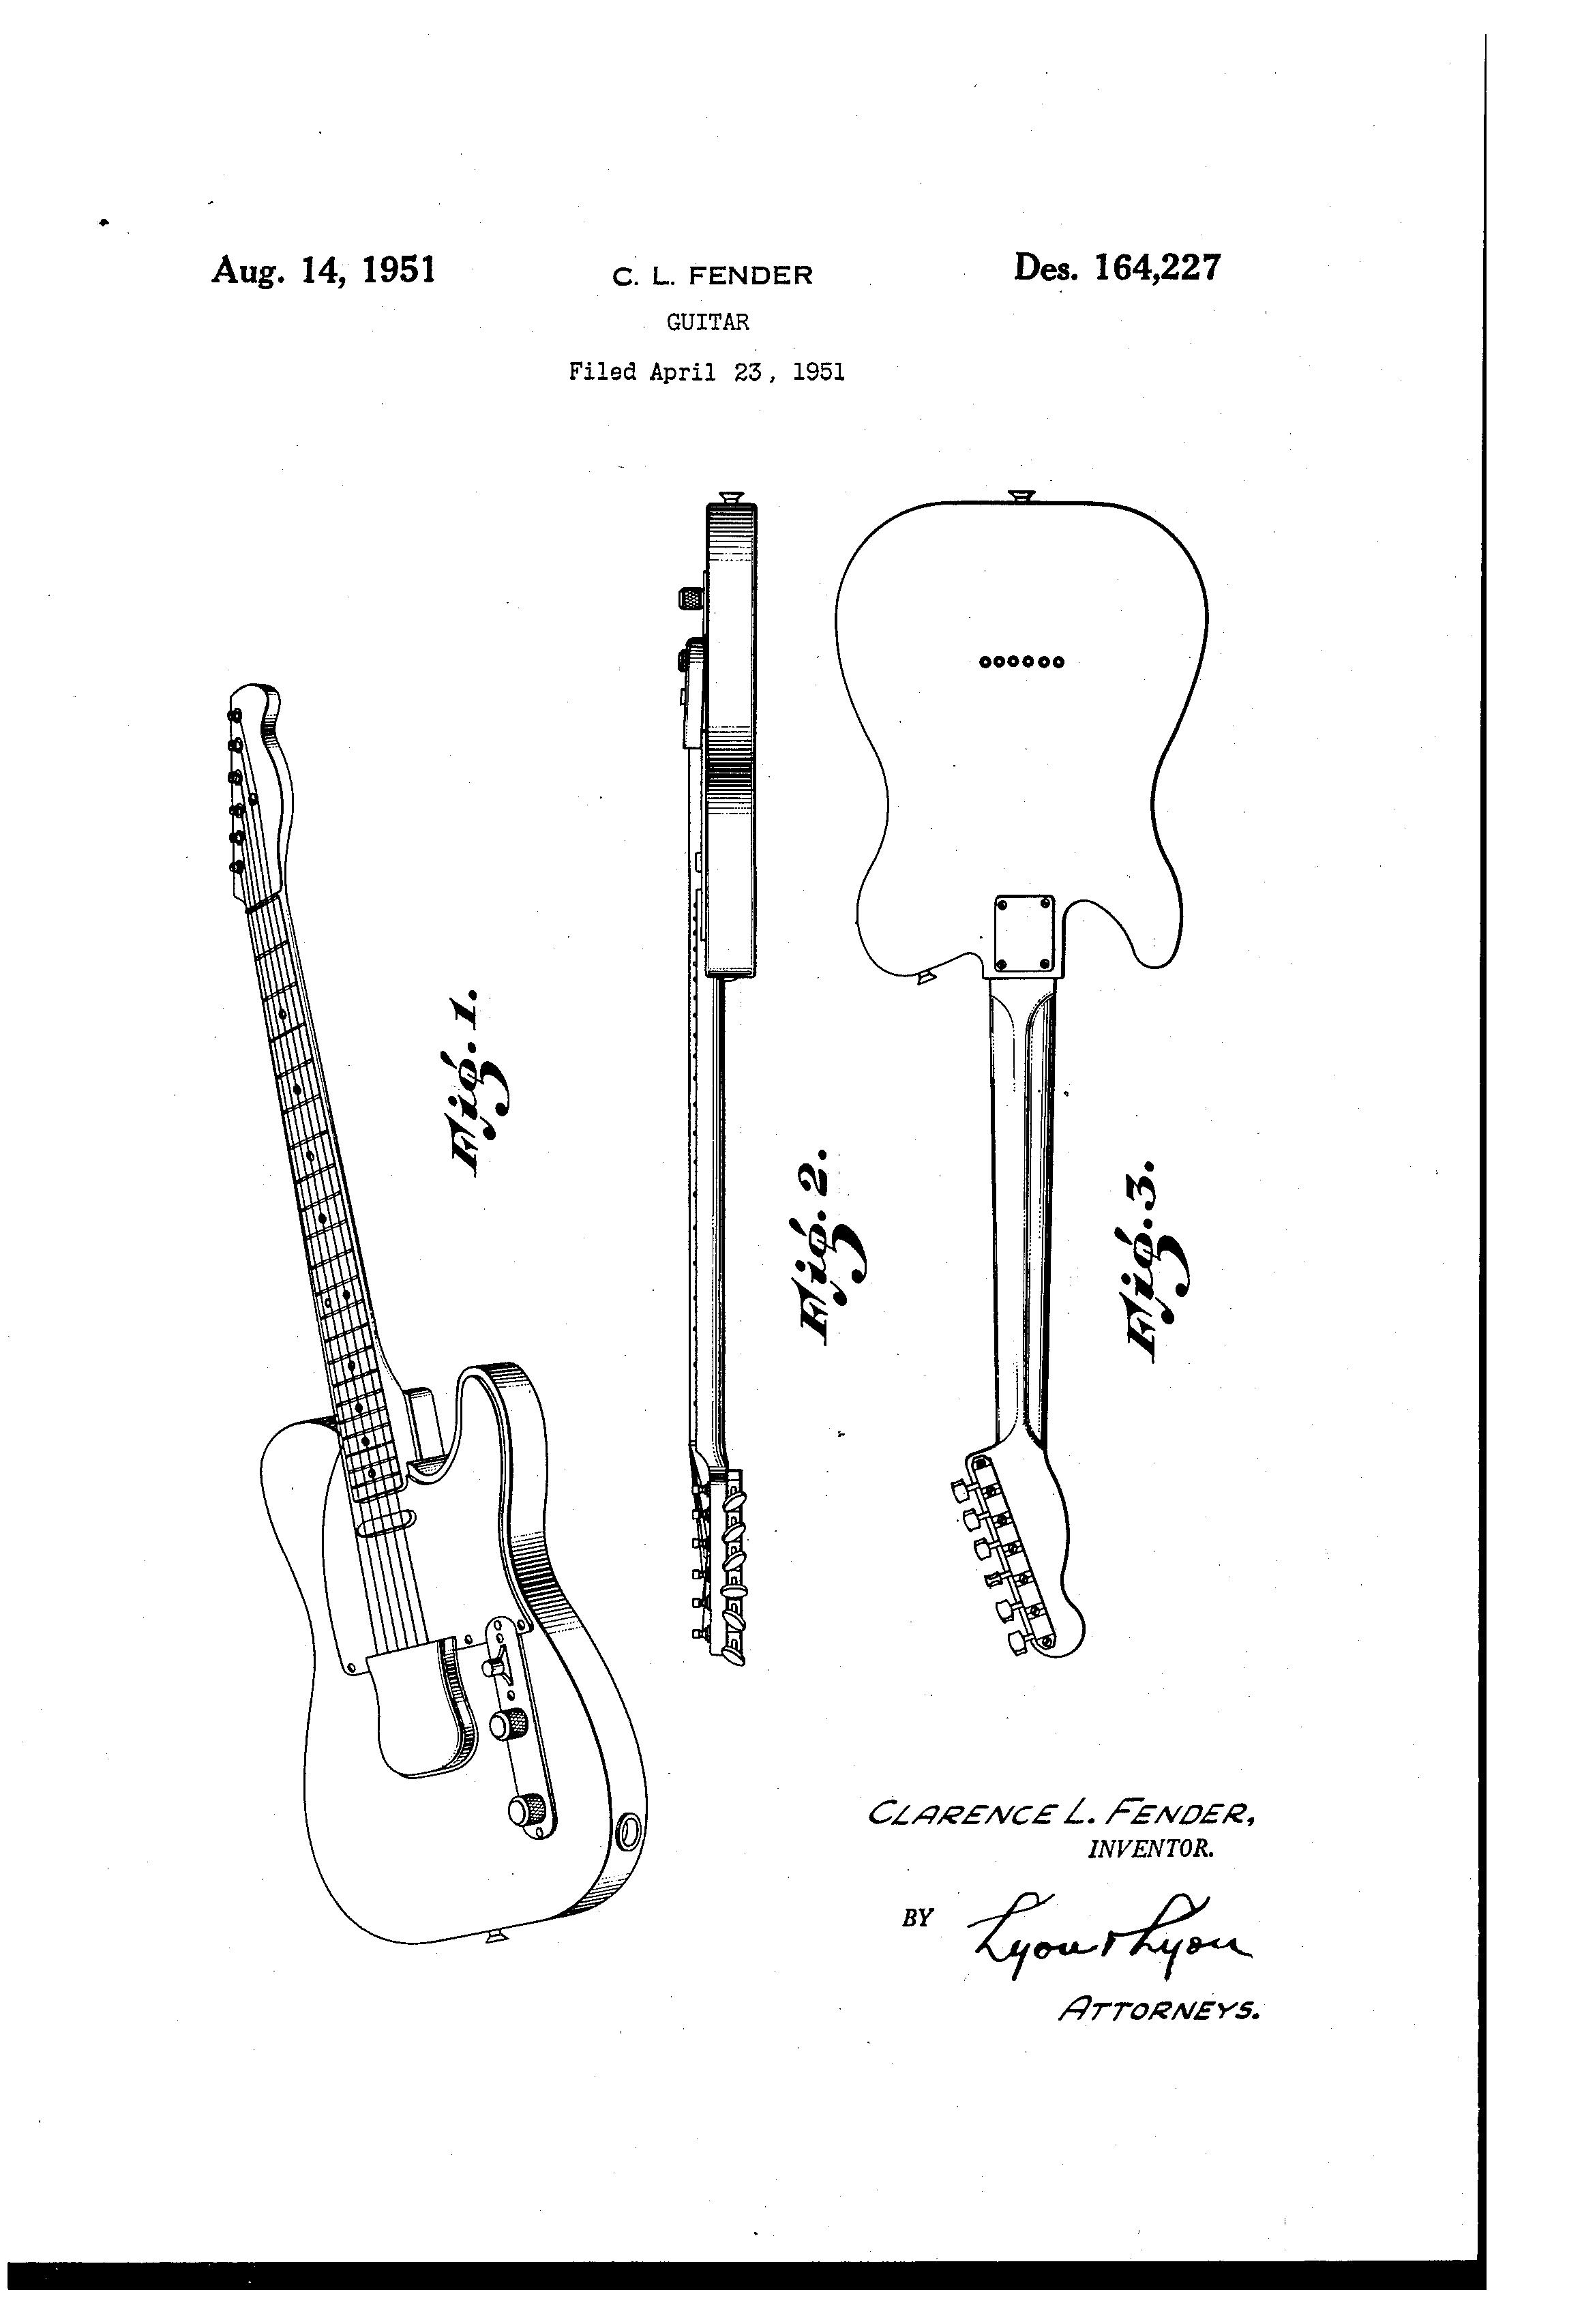 medium resolution of patent usd164227 fender guitar google patents